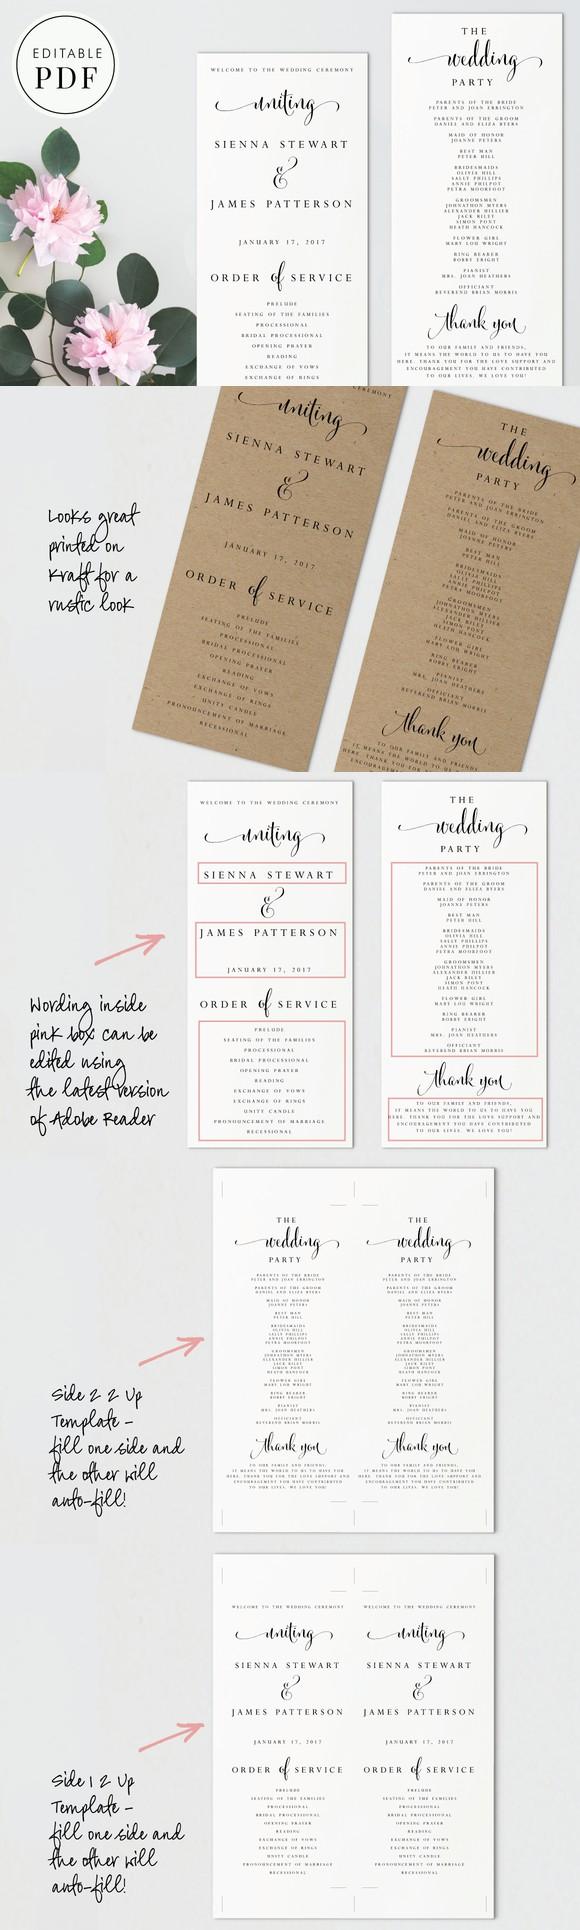 Wedding Program - Editable PDF. Wedding Fonts. $9.00